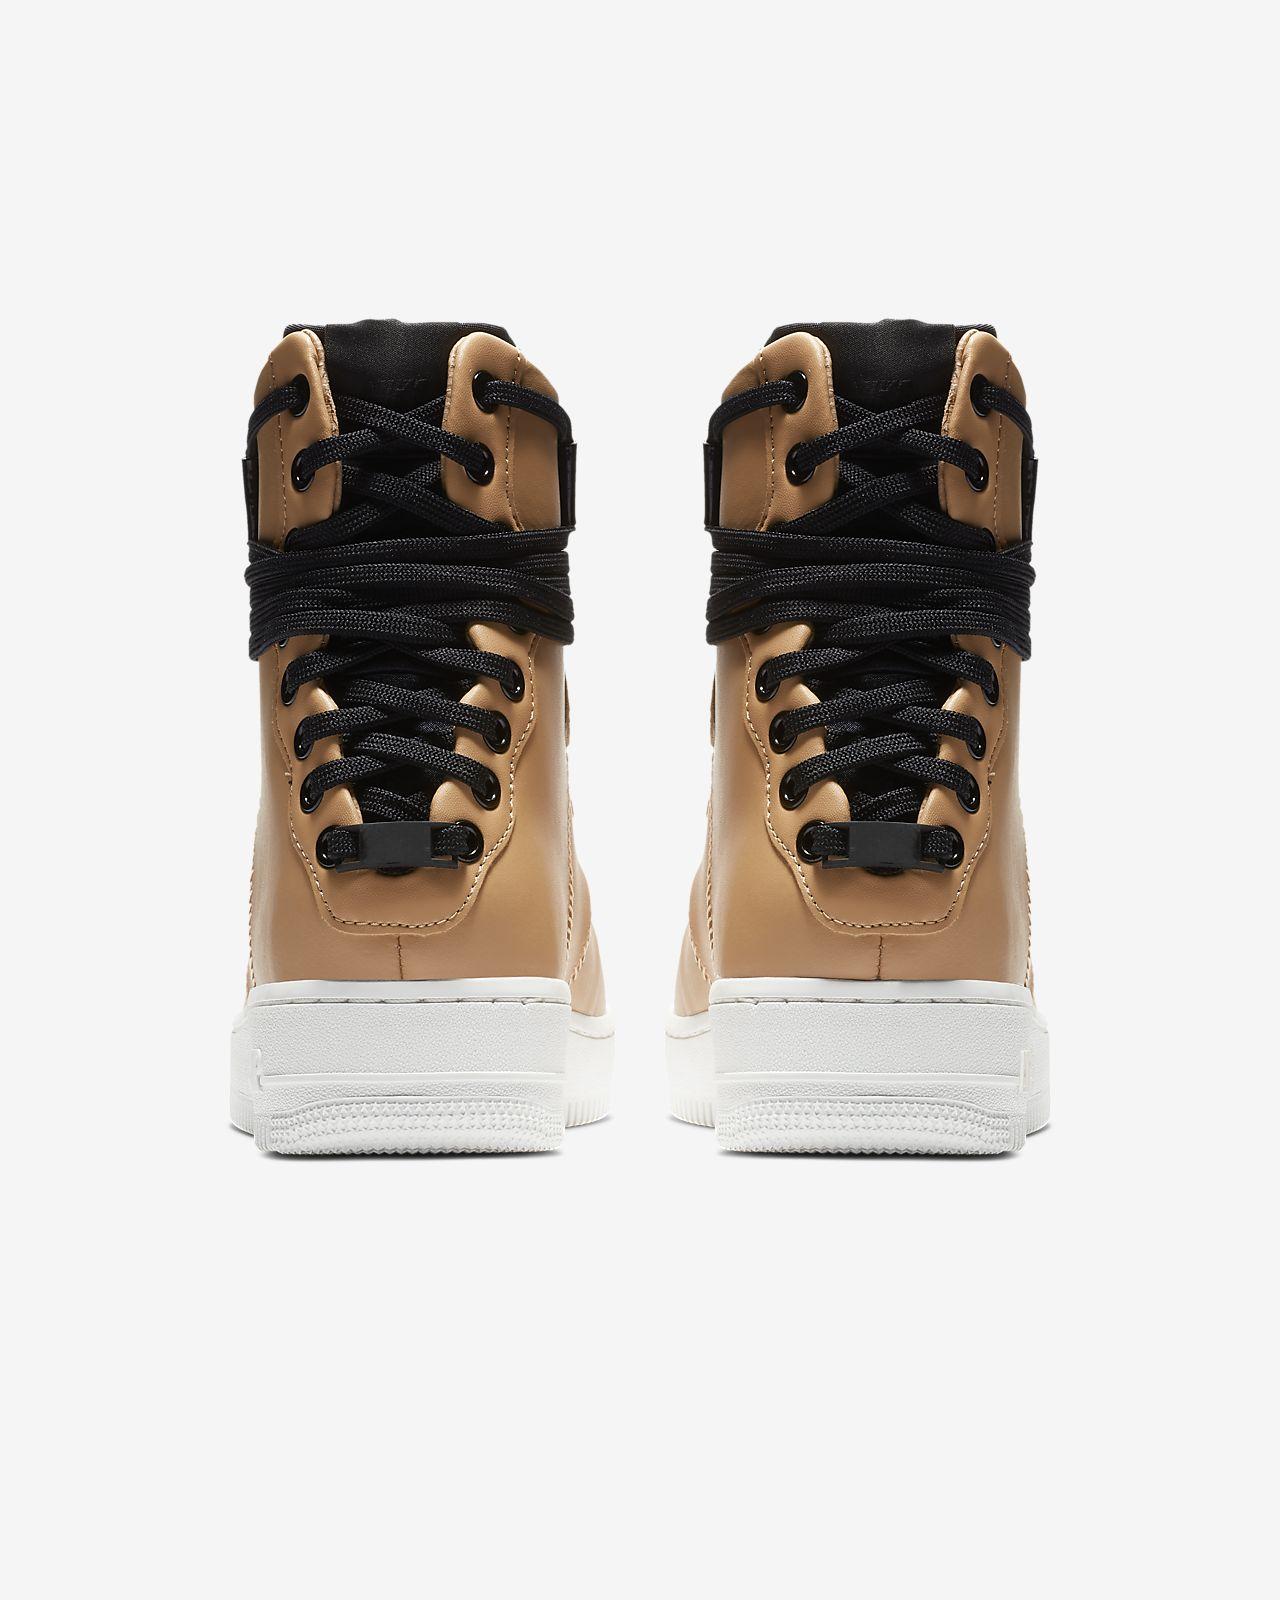 sale retailer 48062 67614 ... Sko Nike AF1 Rebel XX för kvinnor